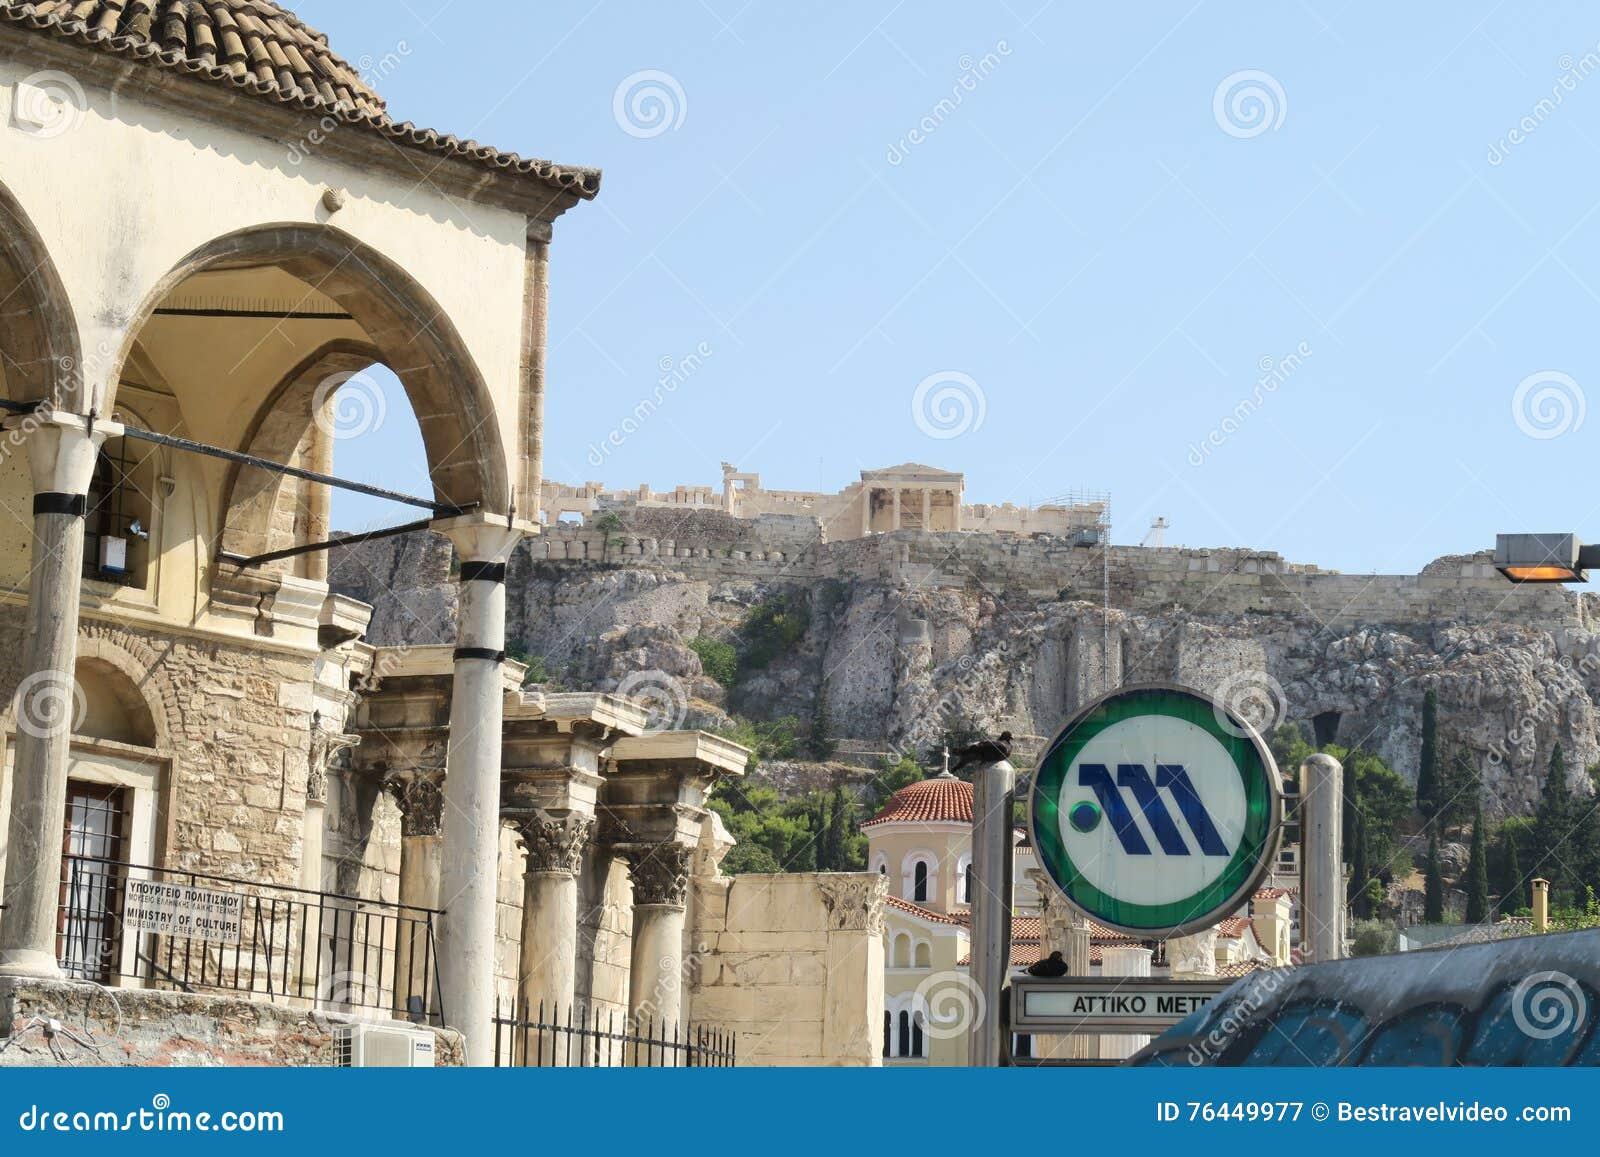 Афины, Греция - 6-ое августа 2016: Знак метро Афин на станции метро Monastiraki